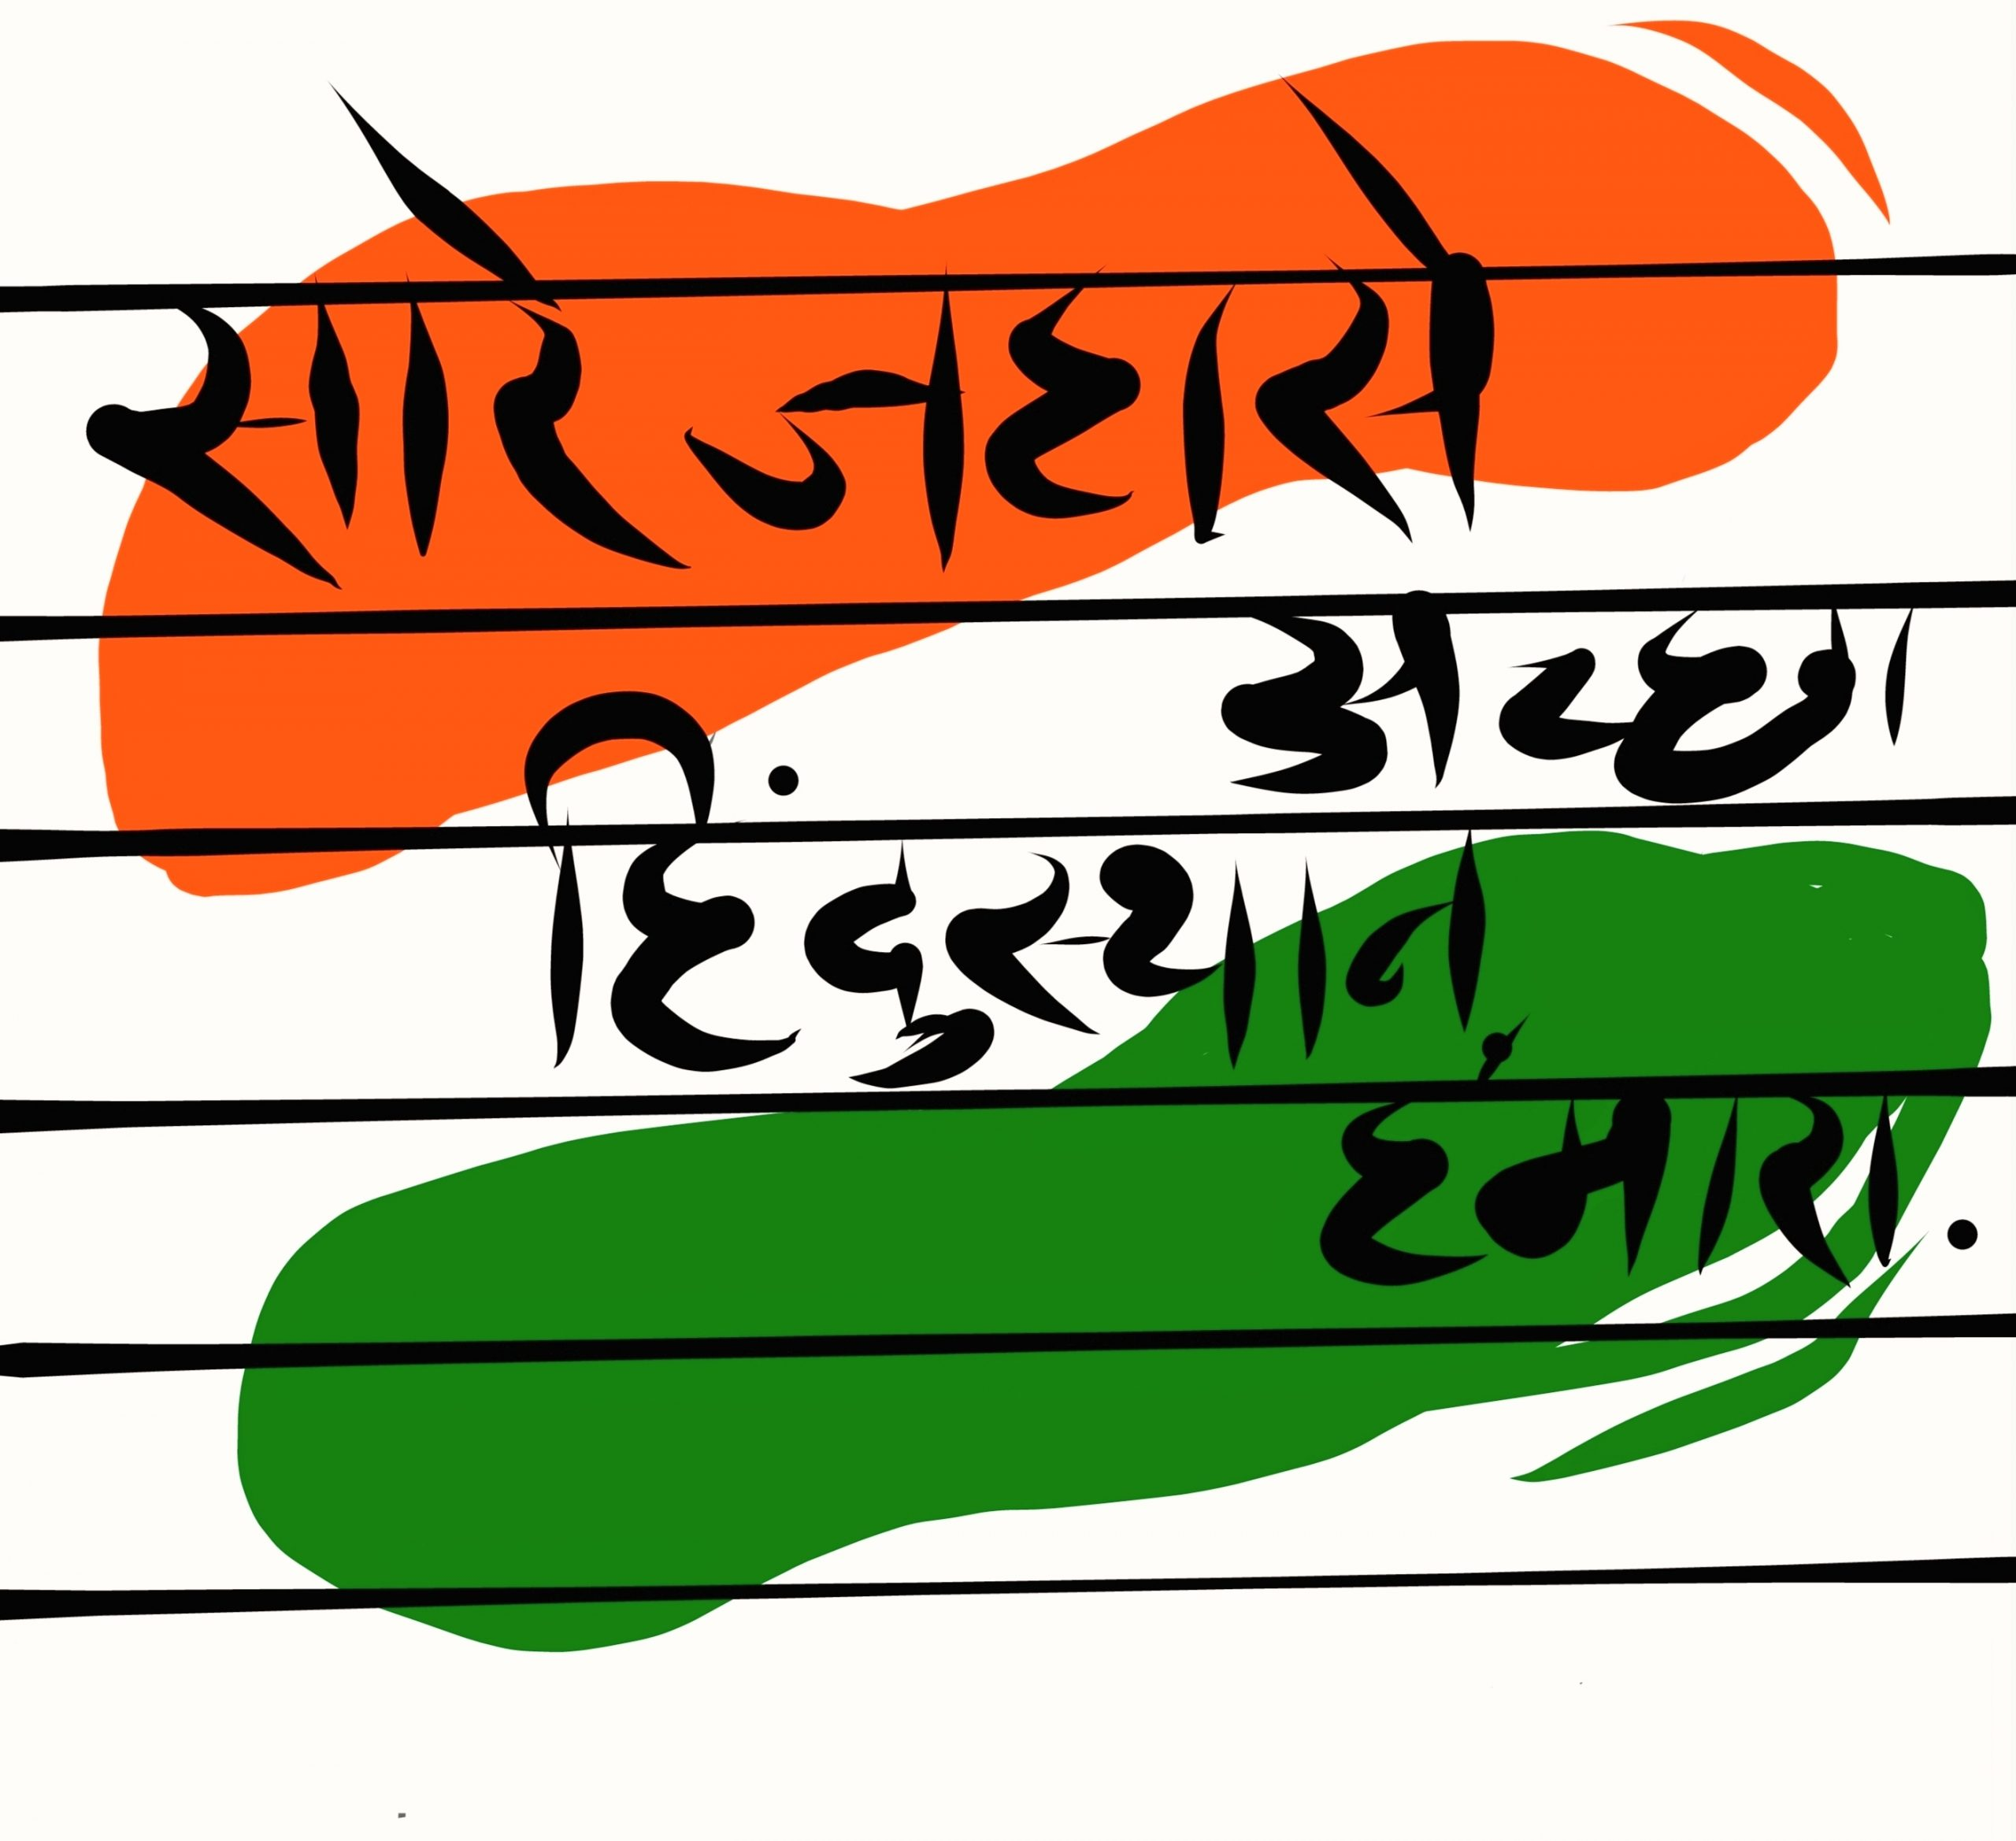 Patriotic lines written in Hindi language